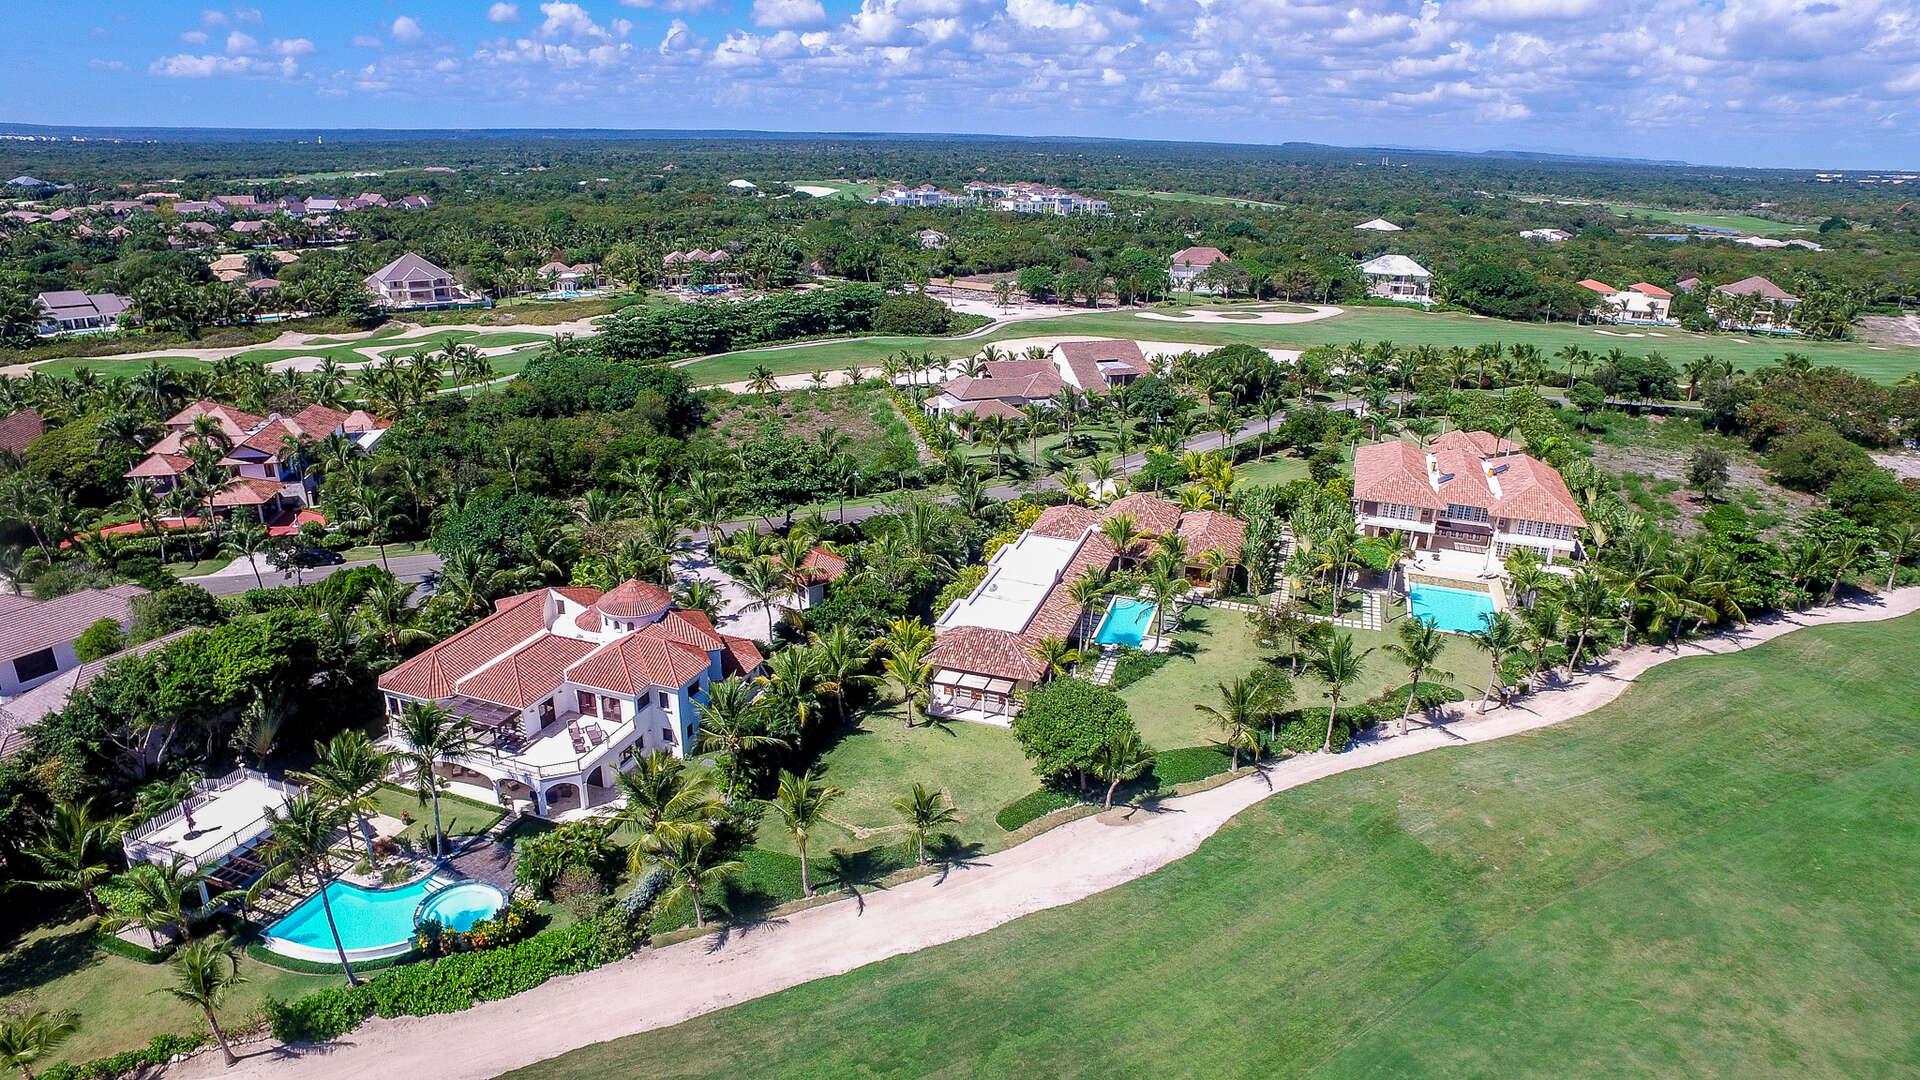 - Arrecife Luxury Estate - Image 1/101